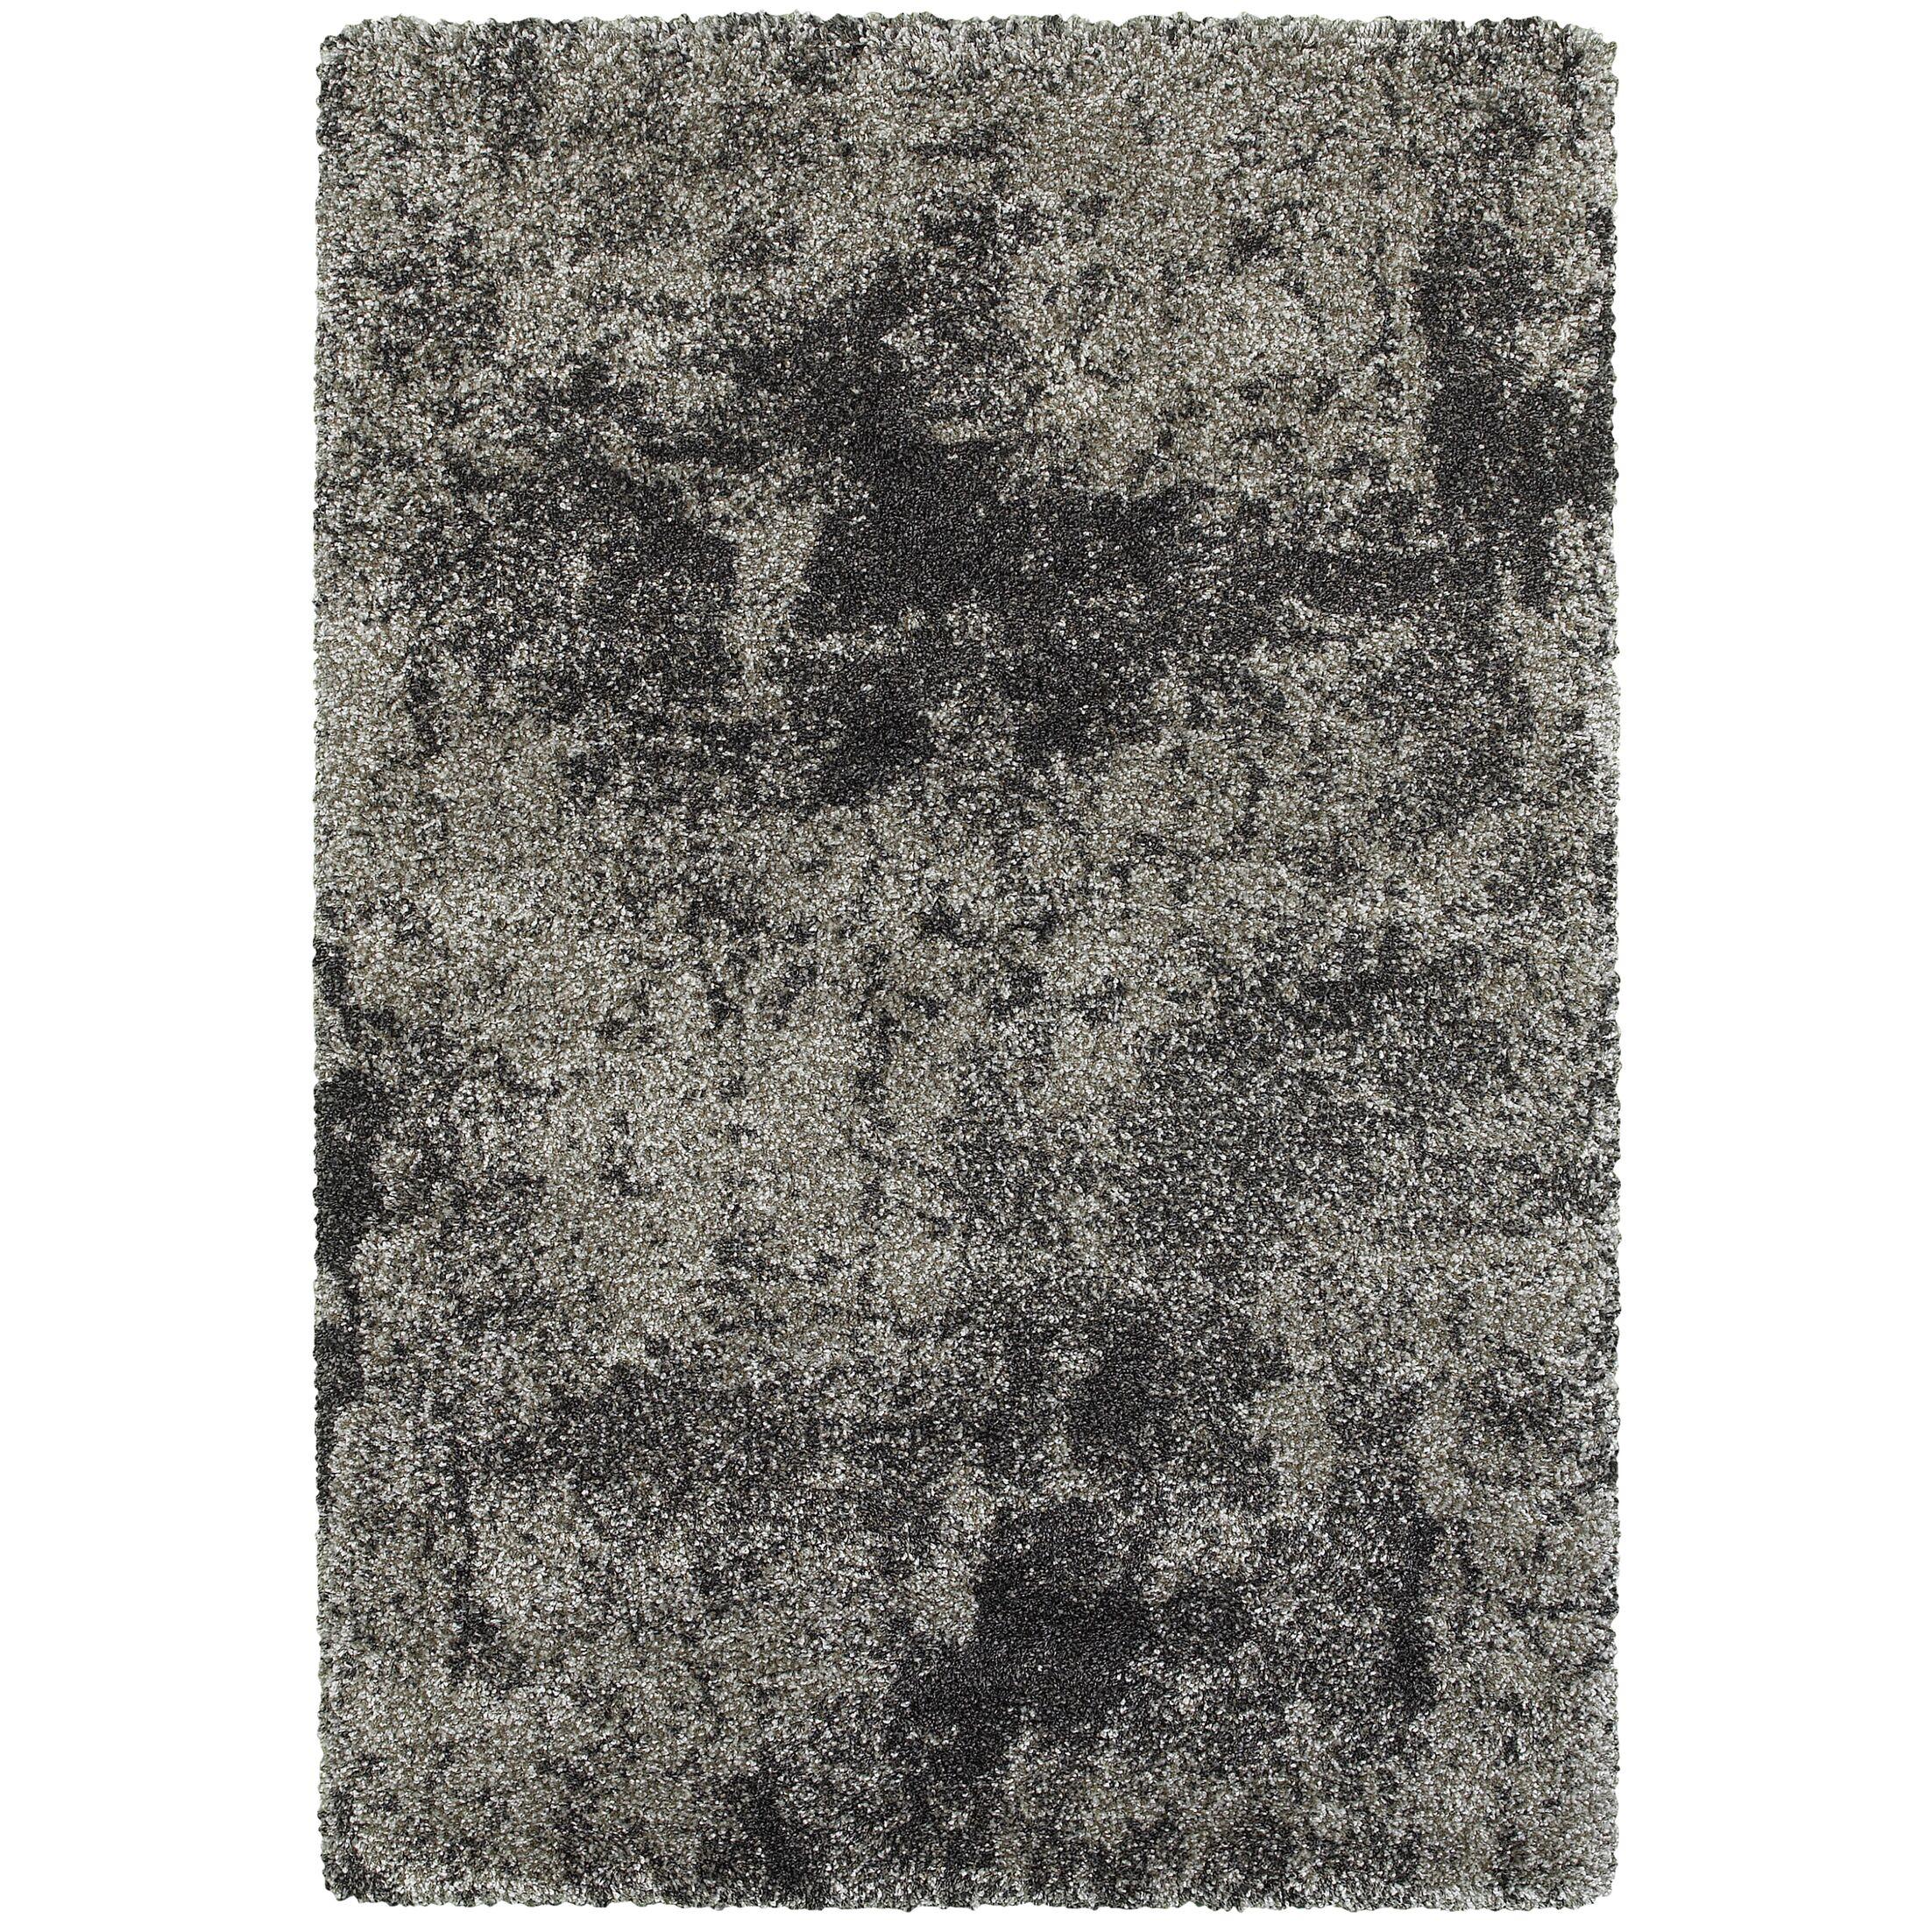 Leonard Gray/Charcoal Area Rug Size: Rectangle 3'10